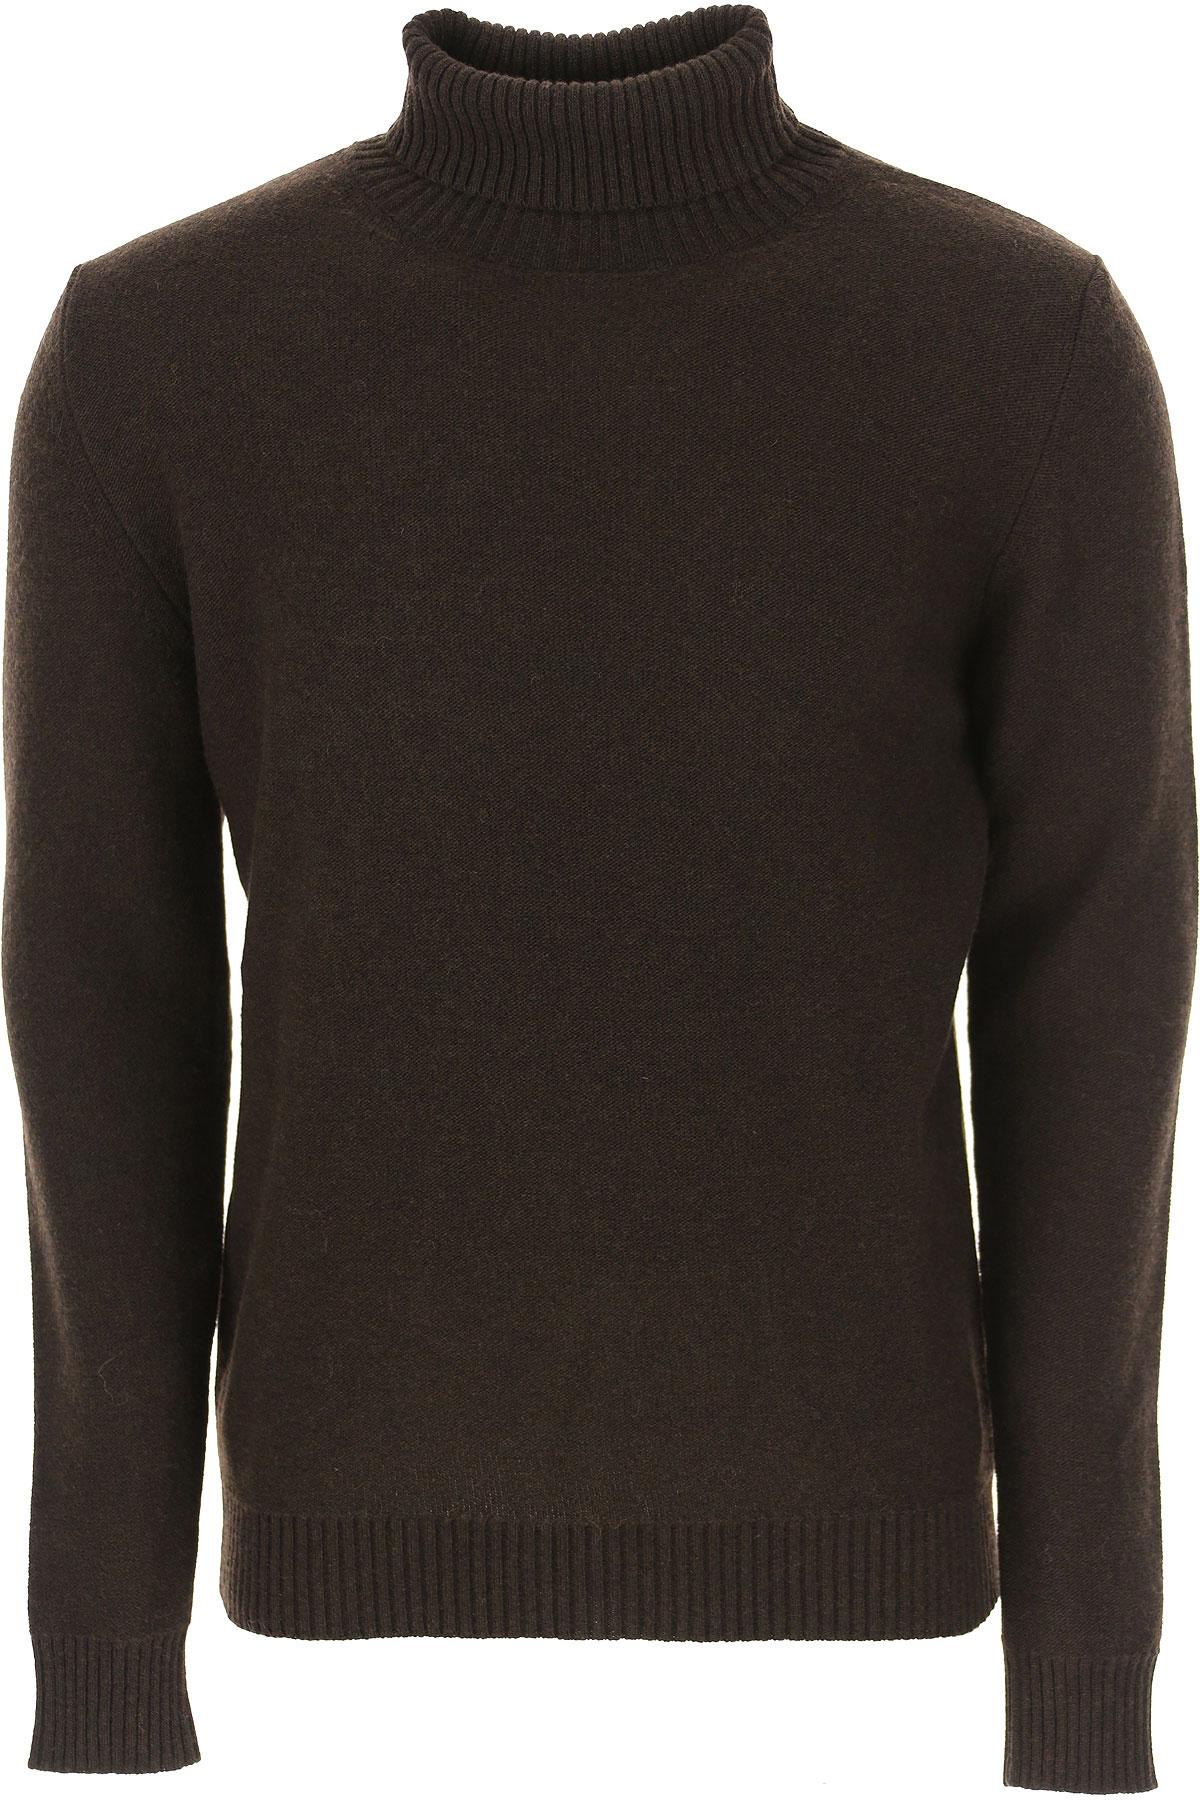 The Gigi Sweater for Men Jumper On Sale, Dark Brown, Wool, 2019, L S